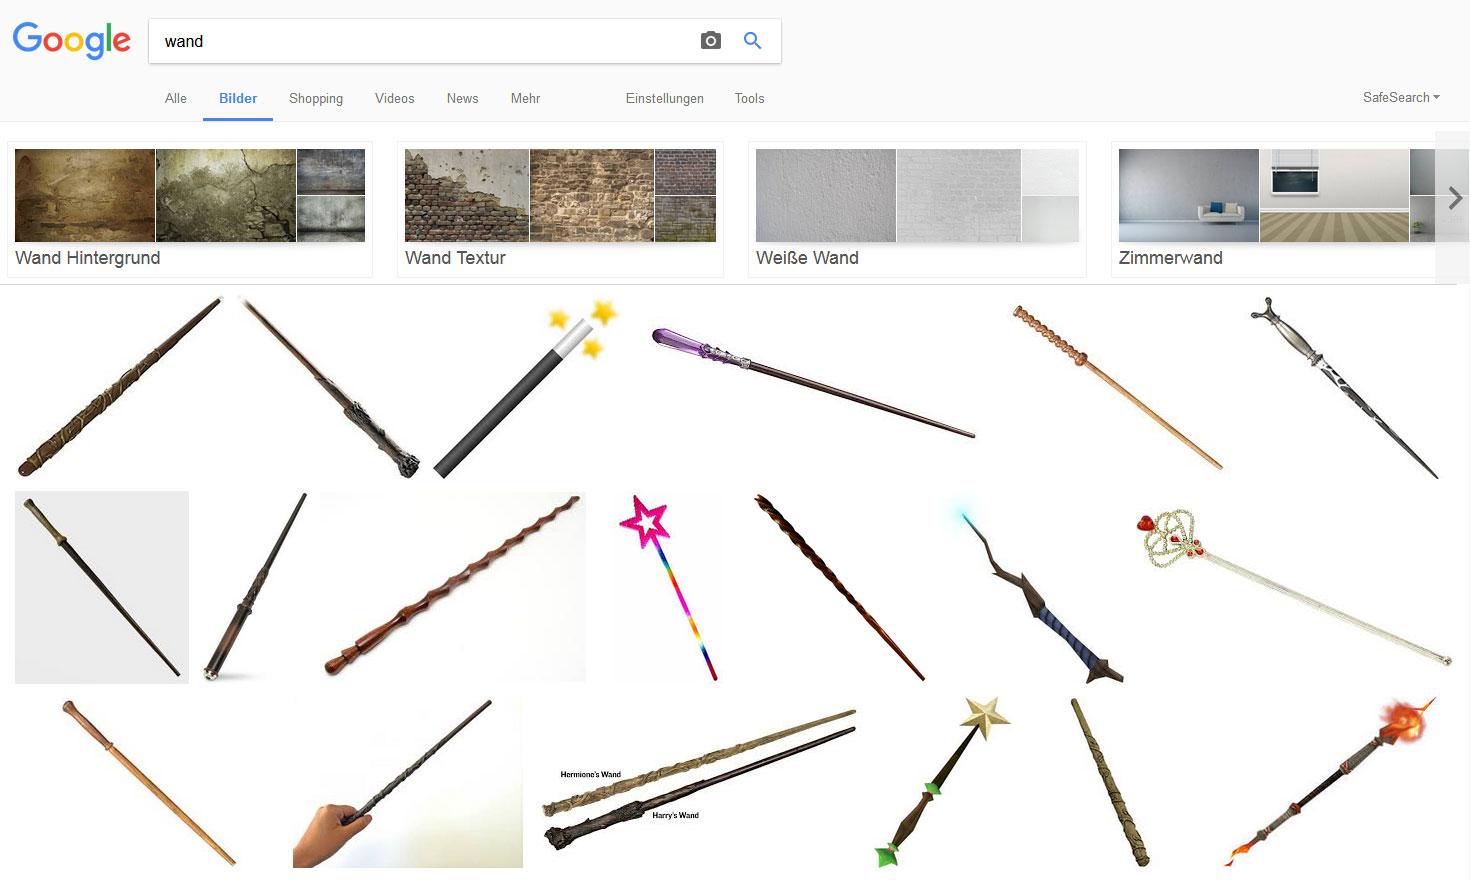 Google Bildersuche: Wand (zeigt Zauberstab)